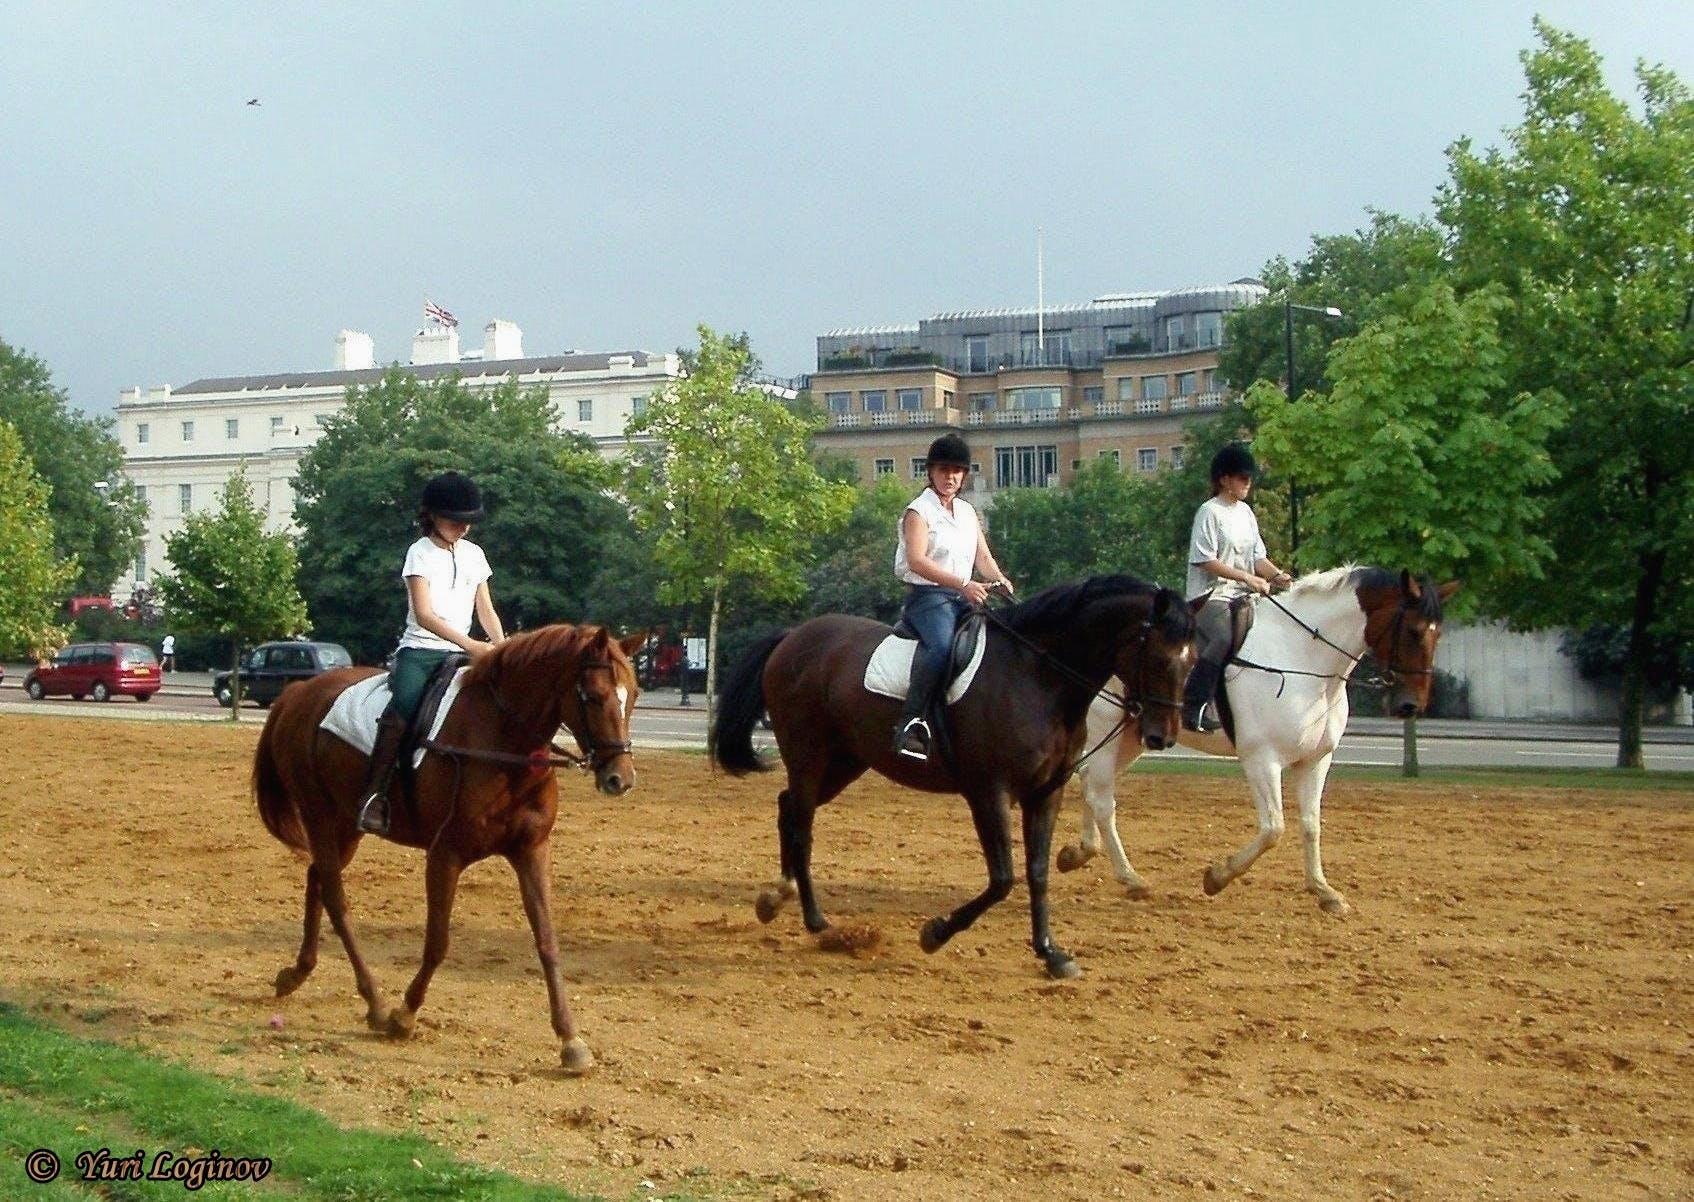 Free stock photo of england, london, united kingdom, Kensington Gardens